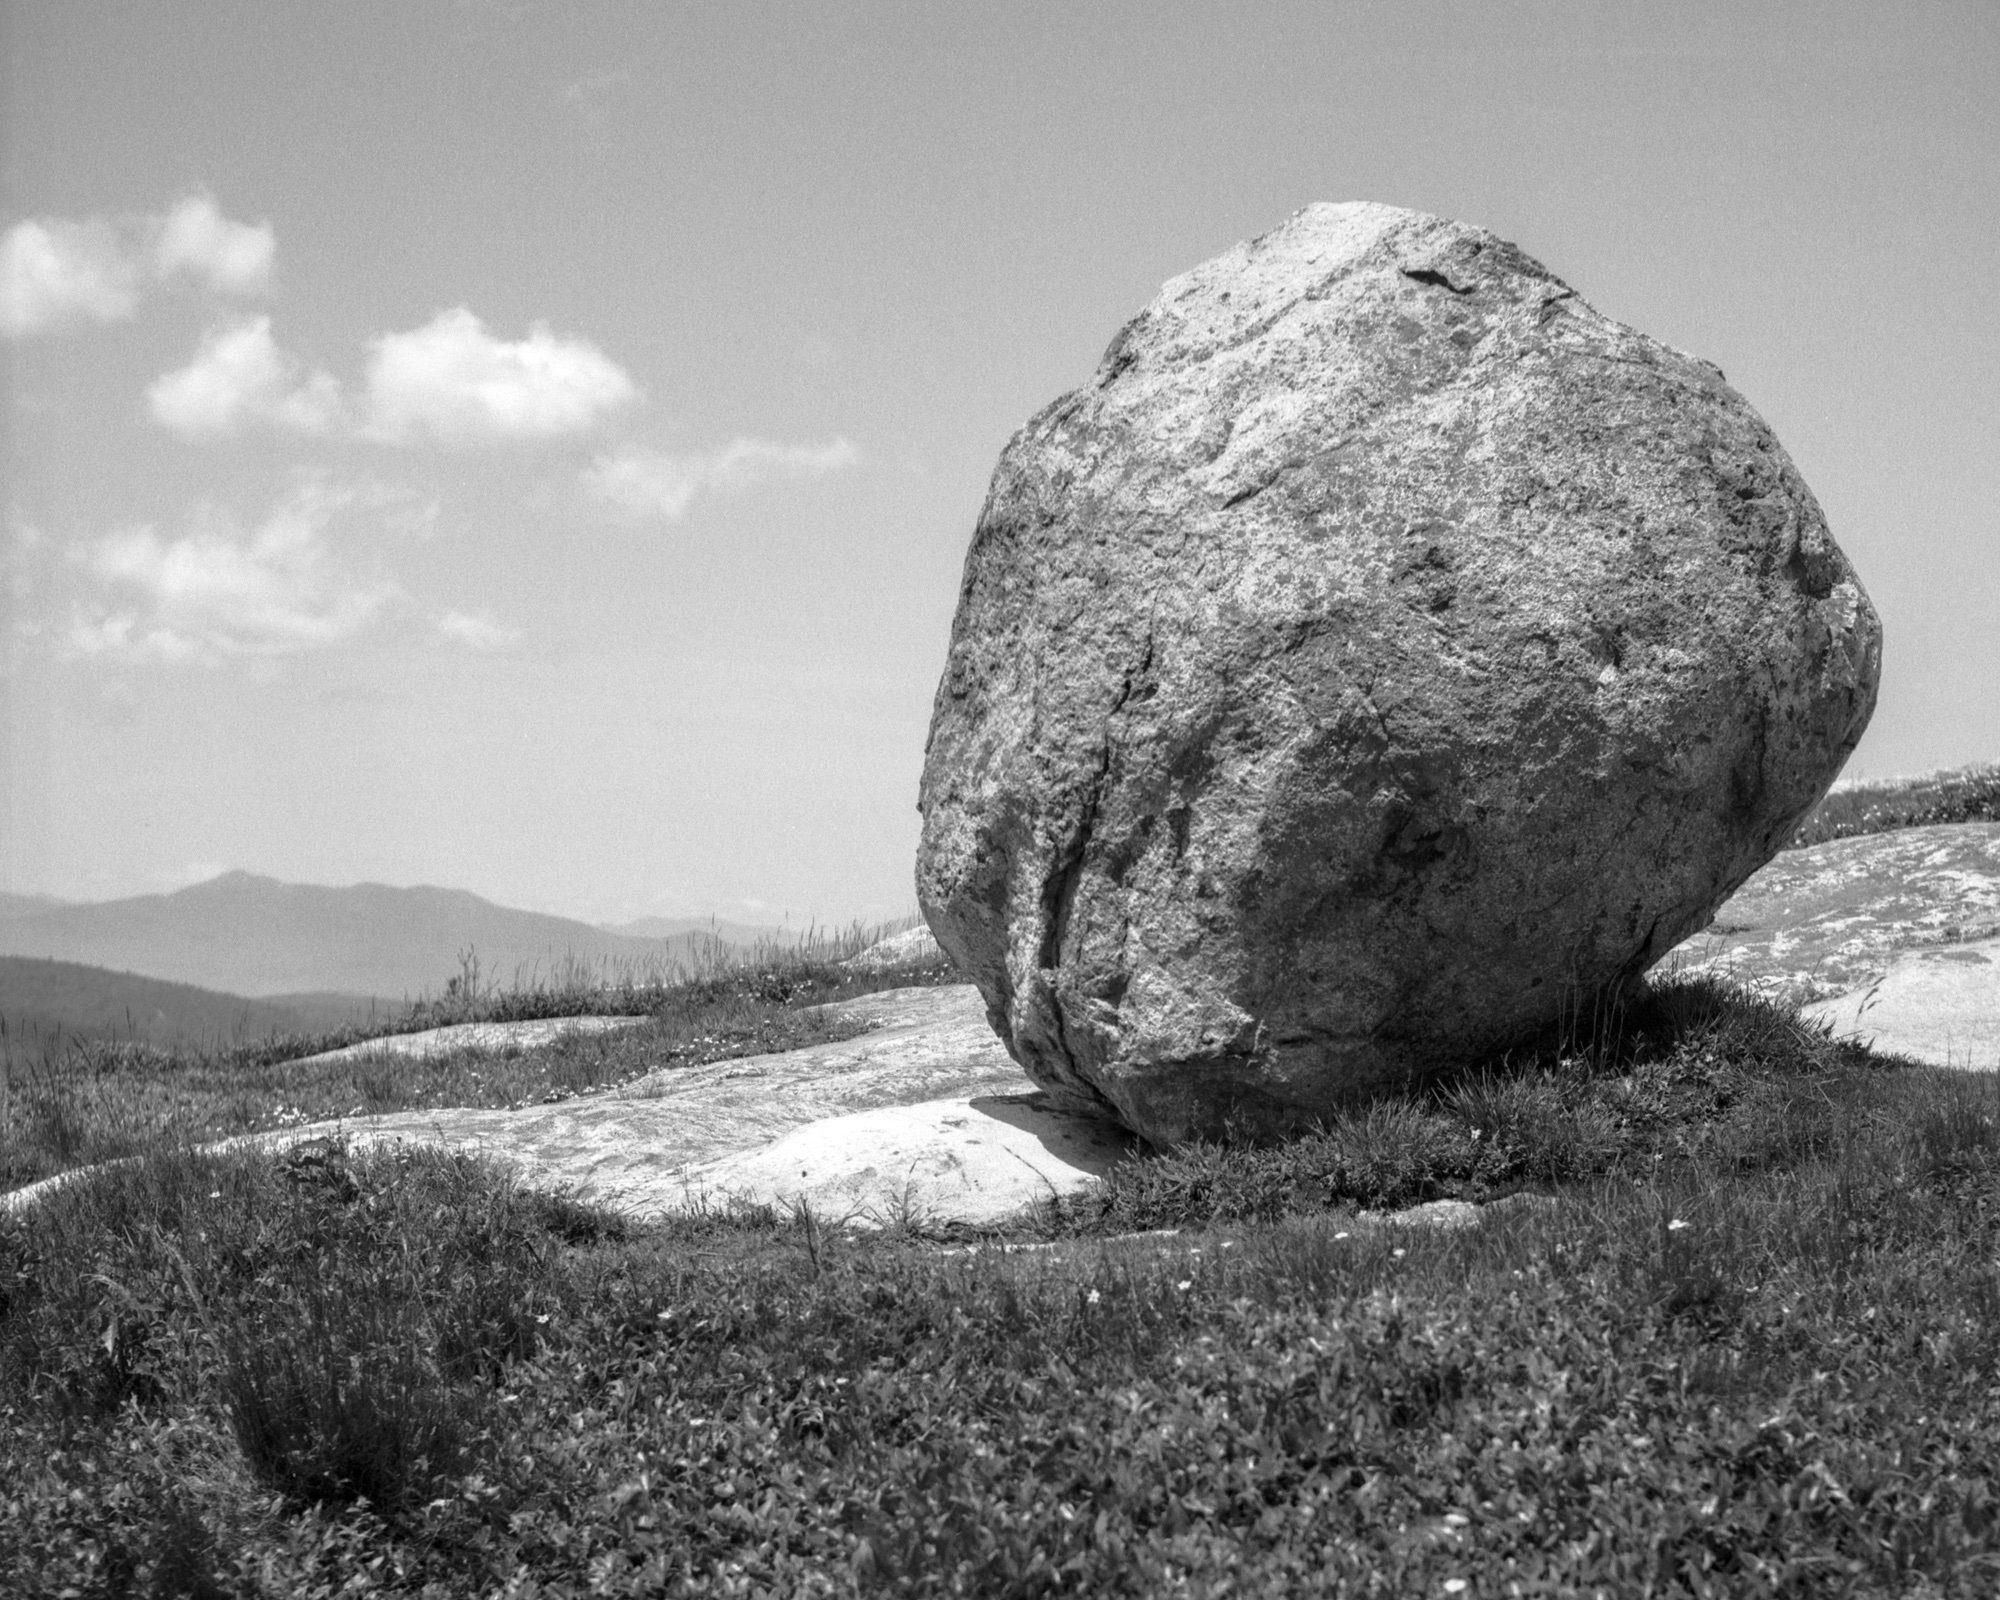 @GregoryWBrown · 20h #ilfordphoto #fridayfavourites #ilfordpanf shot on Yashica MAT #landscape